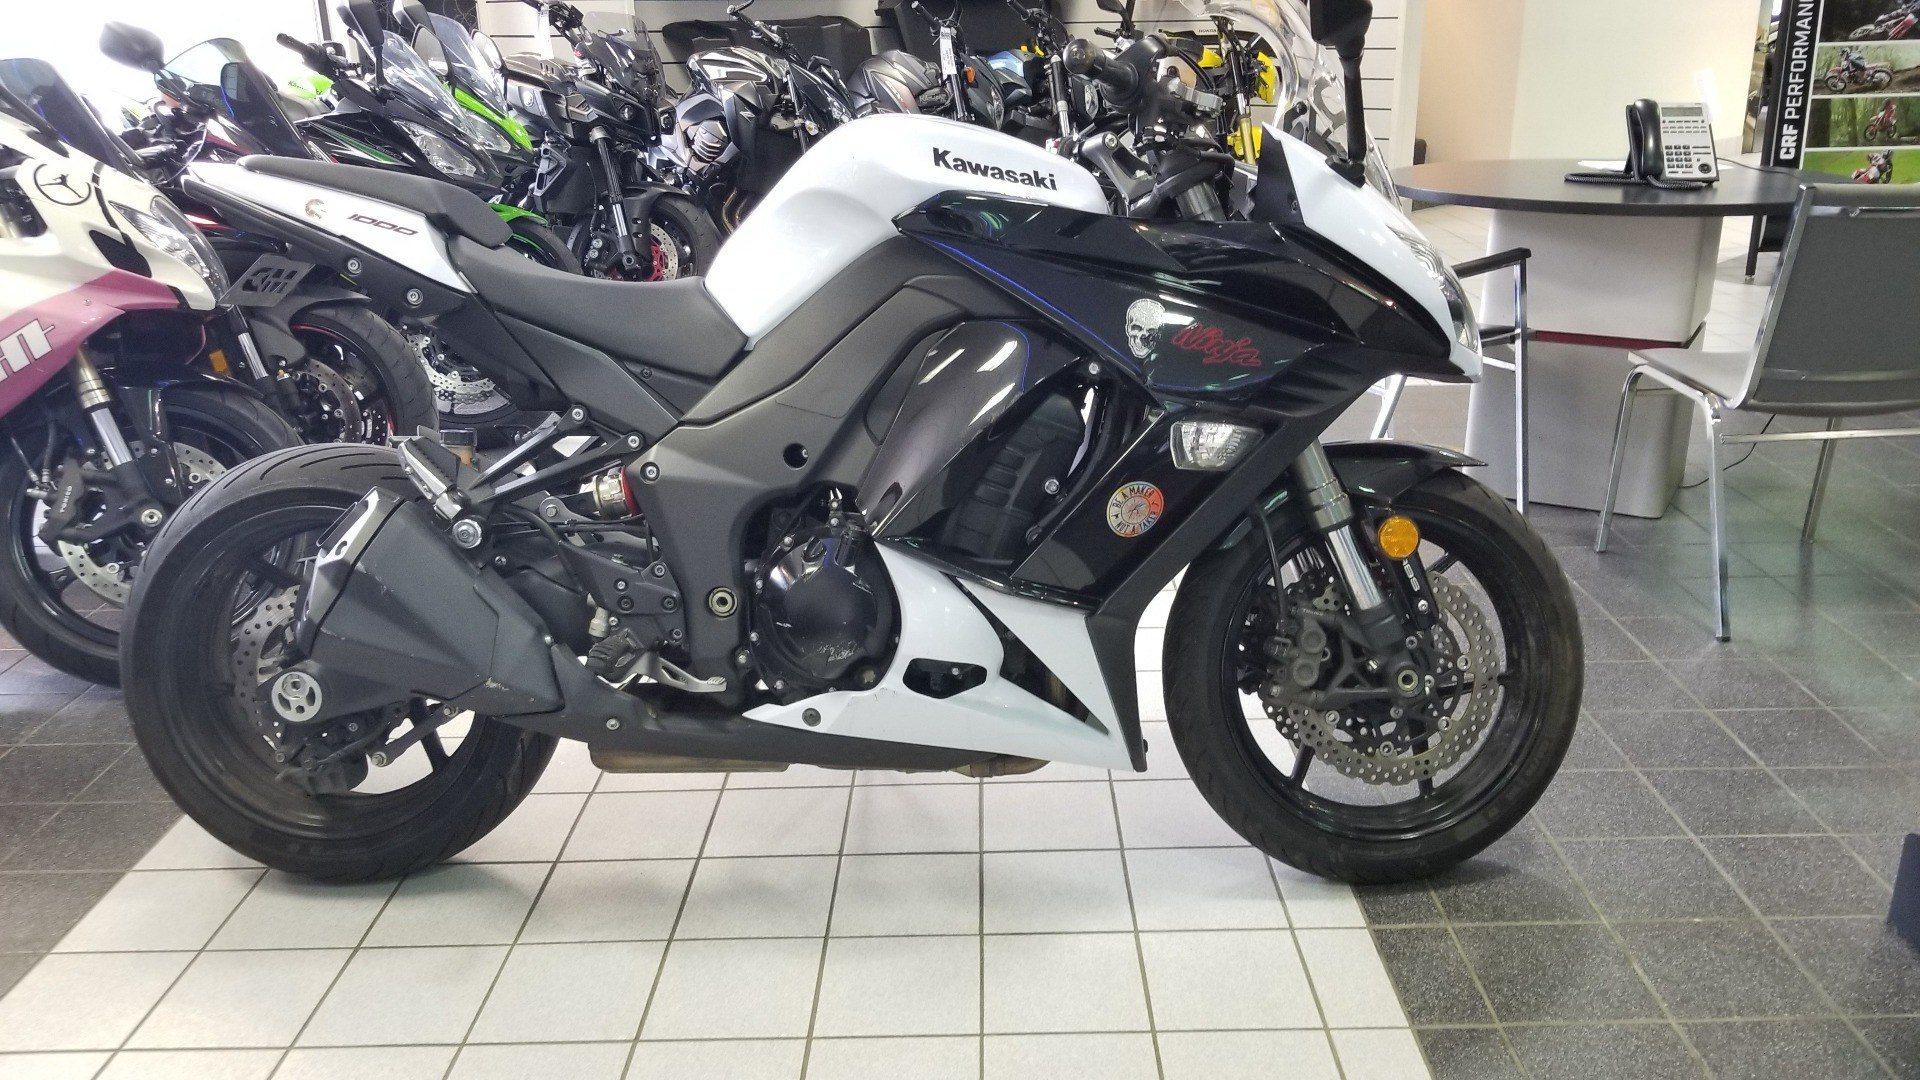 Used 2013 Kawasaki Ninja 1000 Abs Motorcycles In Asheville Nc